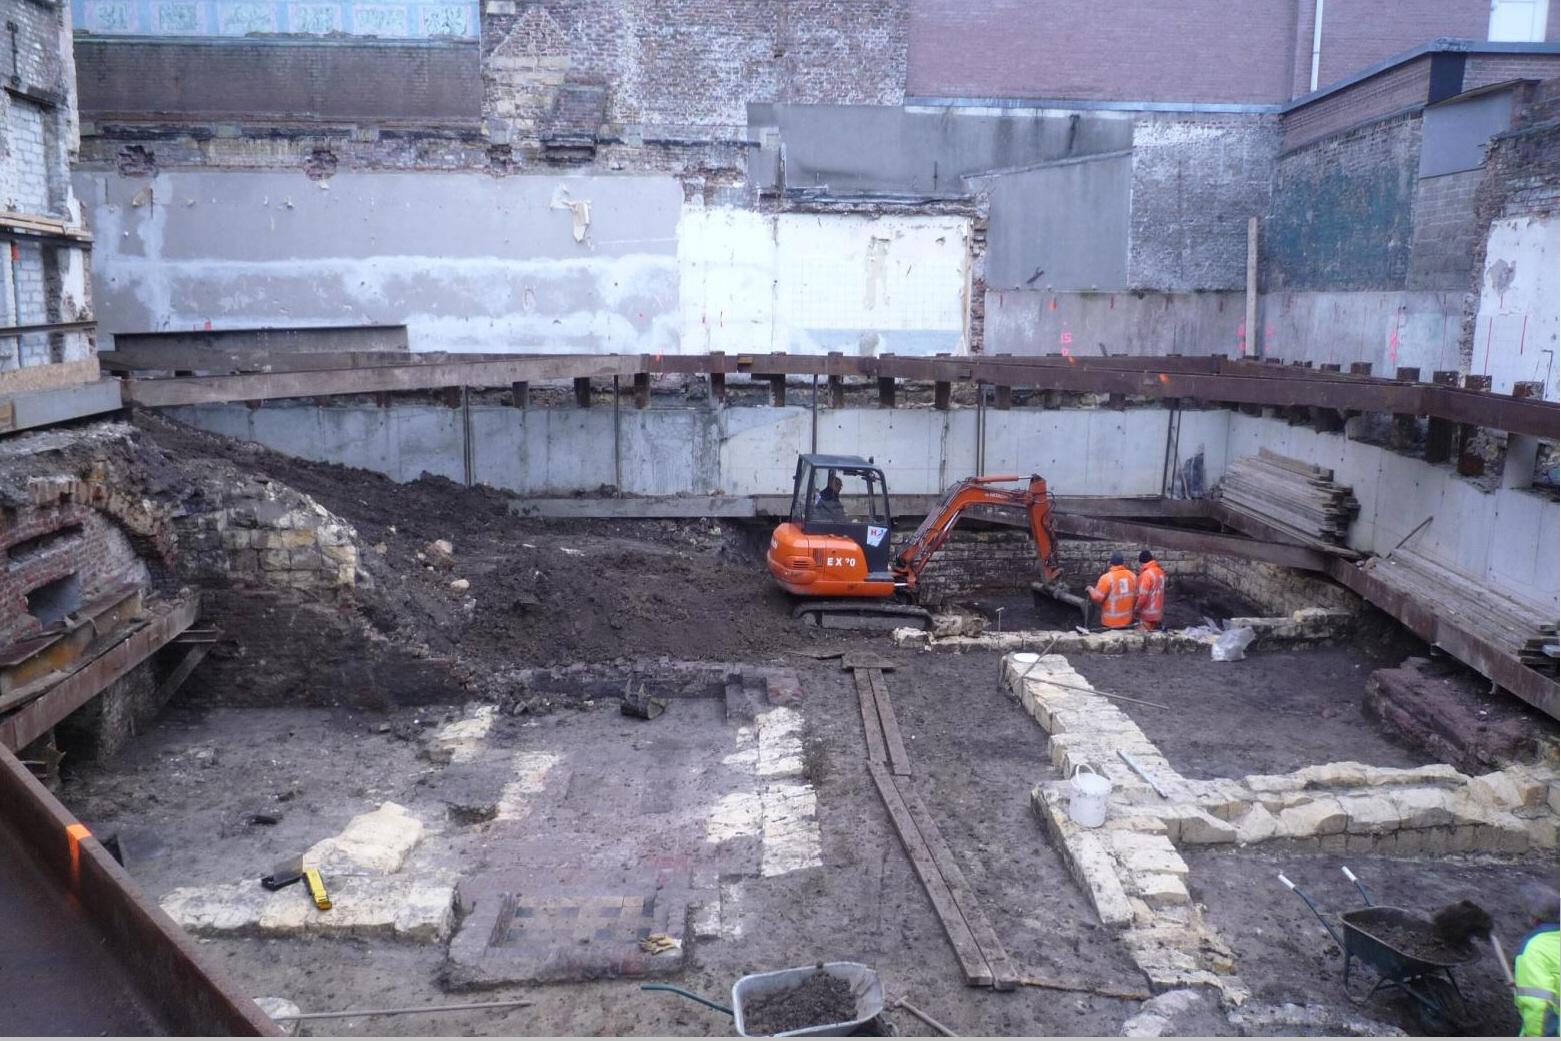 Archeologische Opgraving Opgravingsput Grote Staat Maastricht